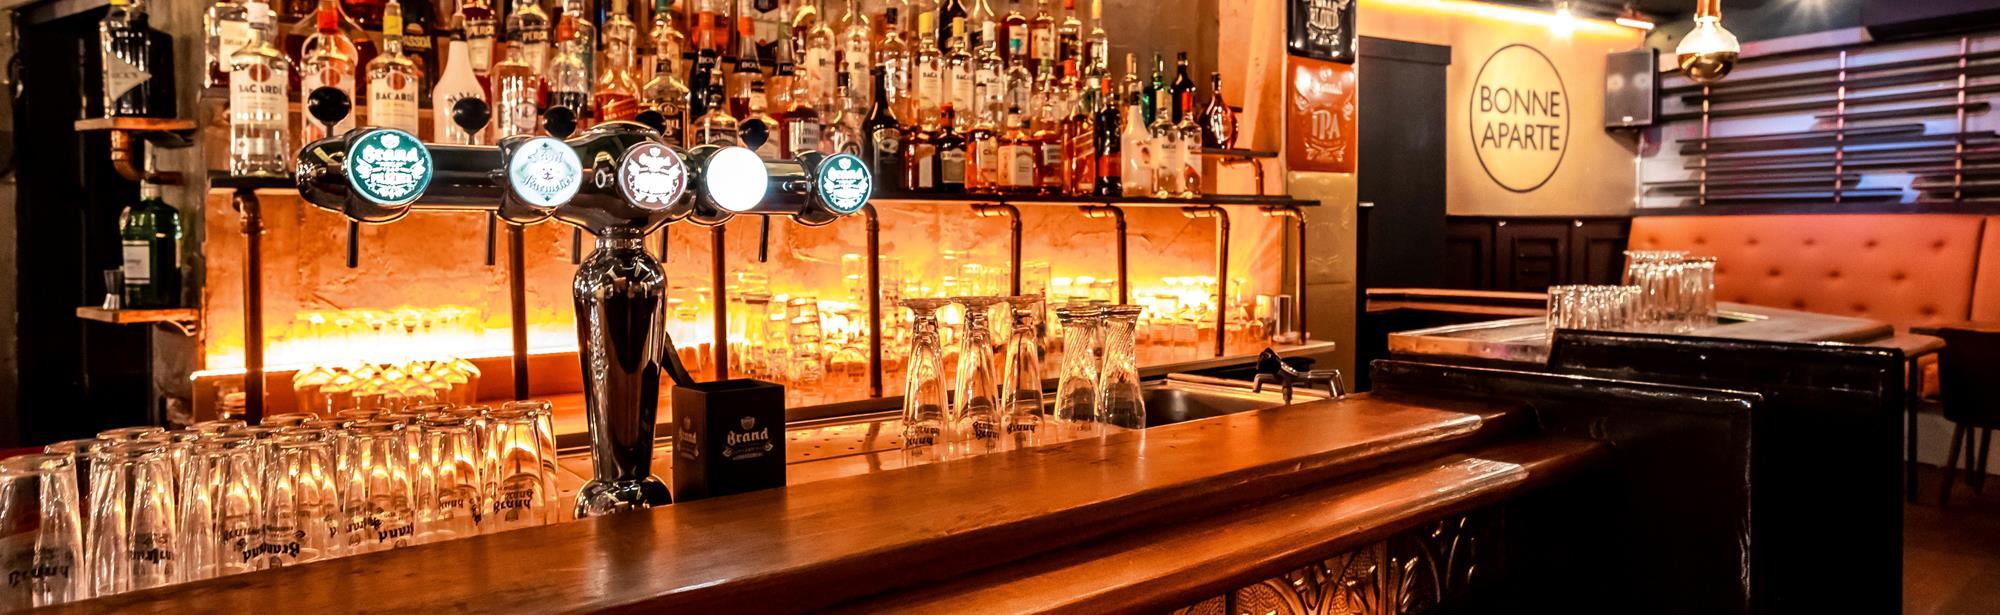 Bonne Aparte Food|Drinks